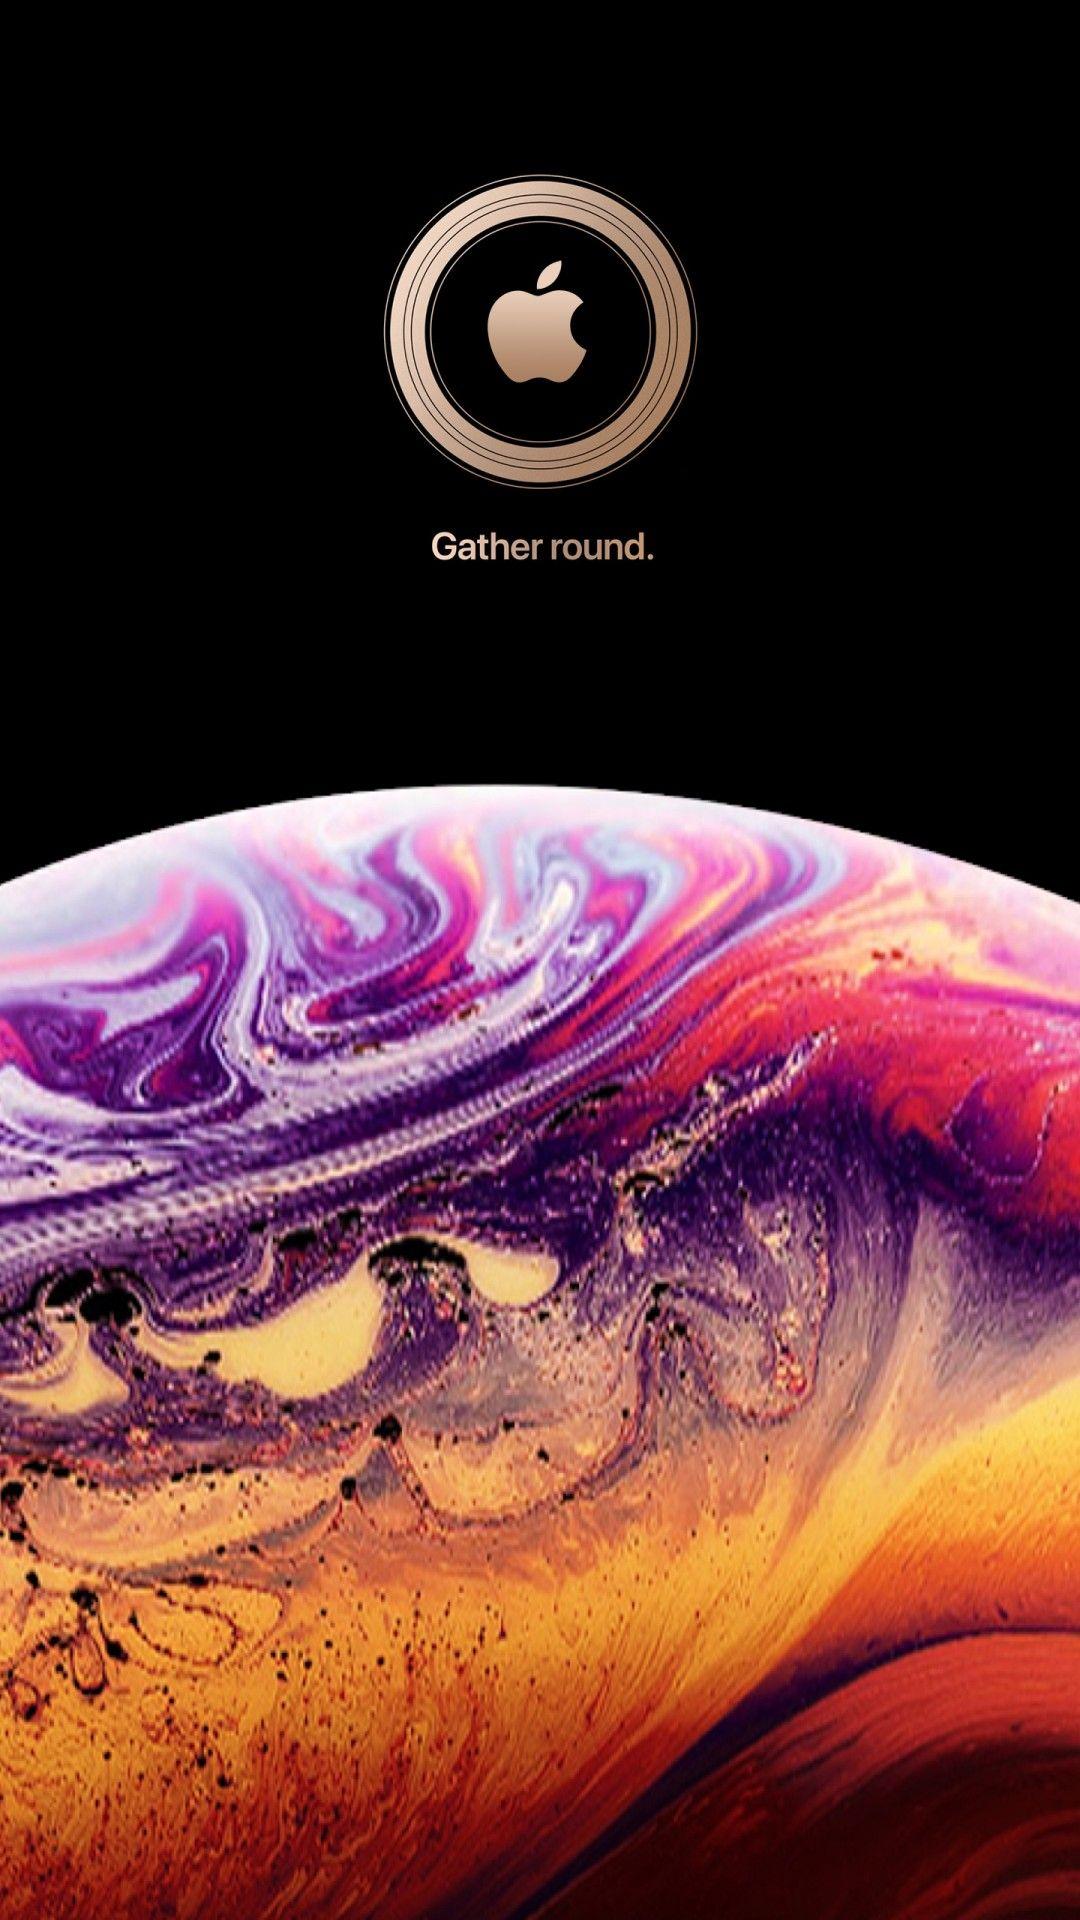 Apple wallpaper iphone, Apple logo ...